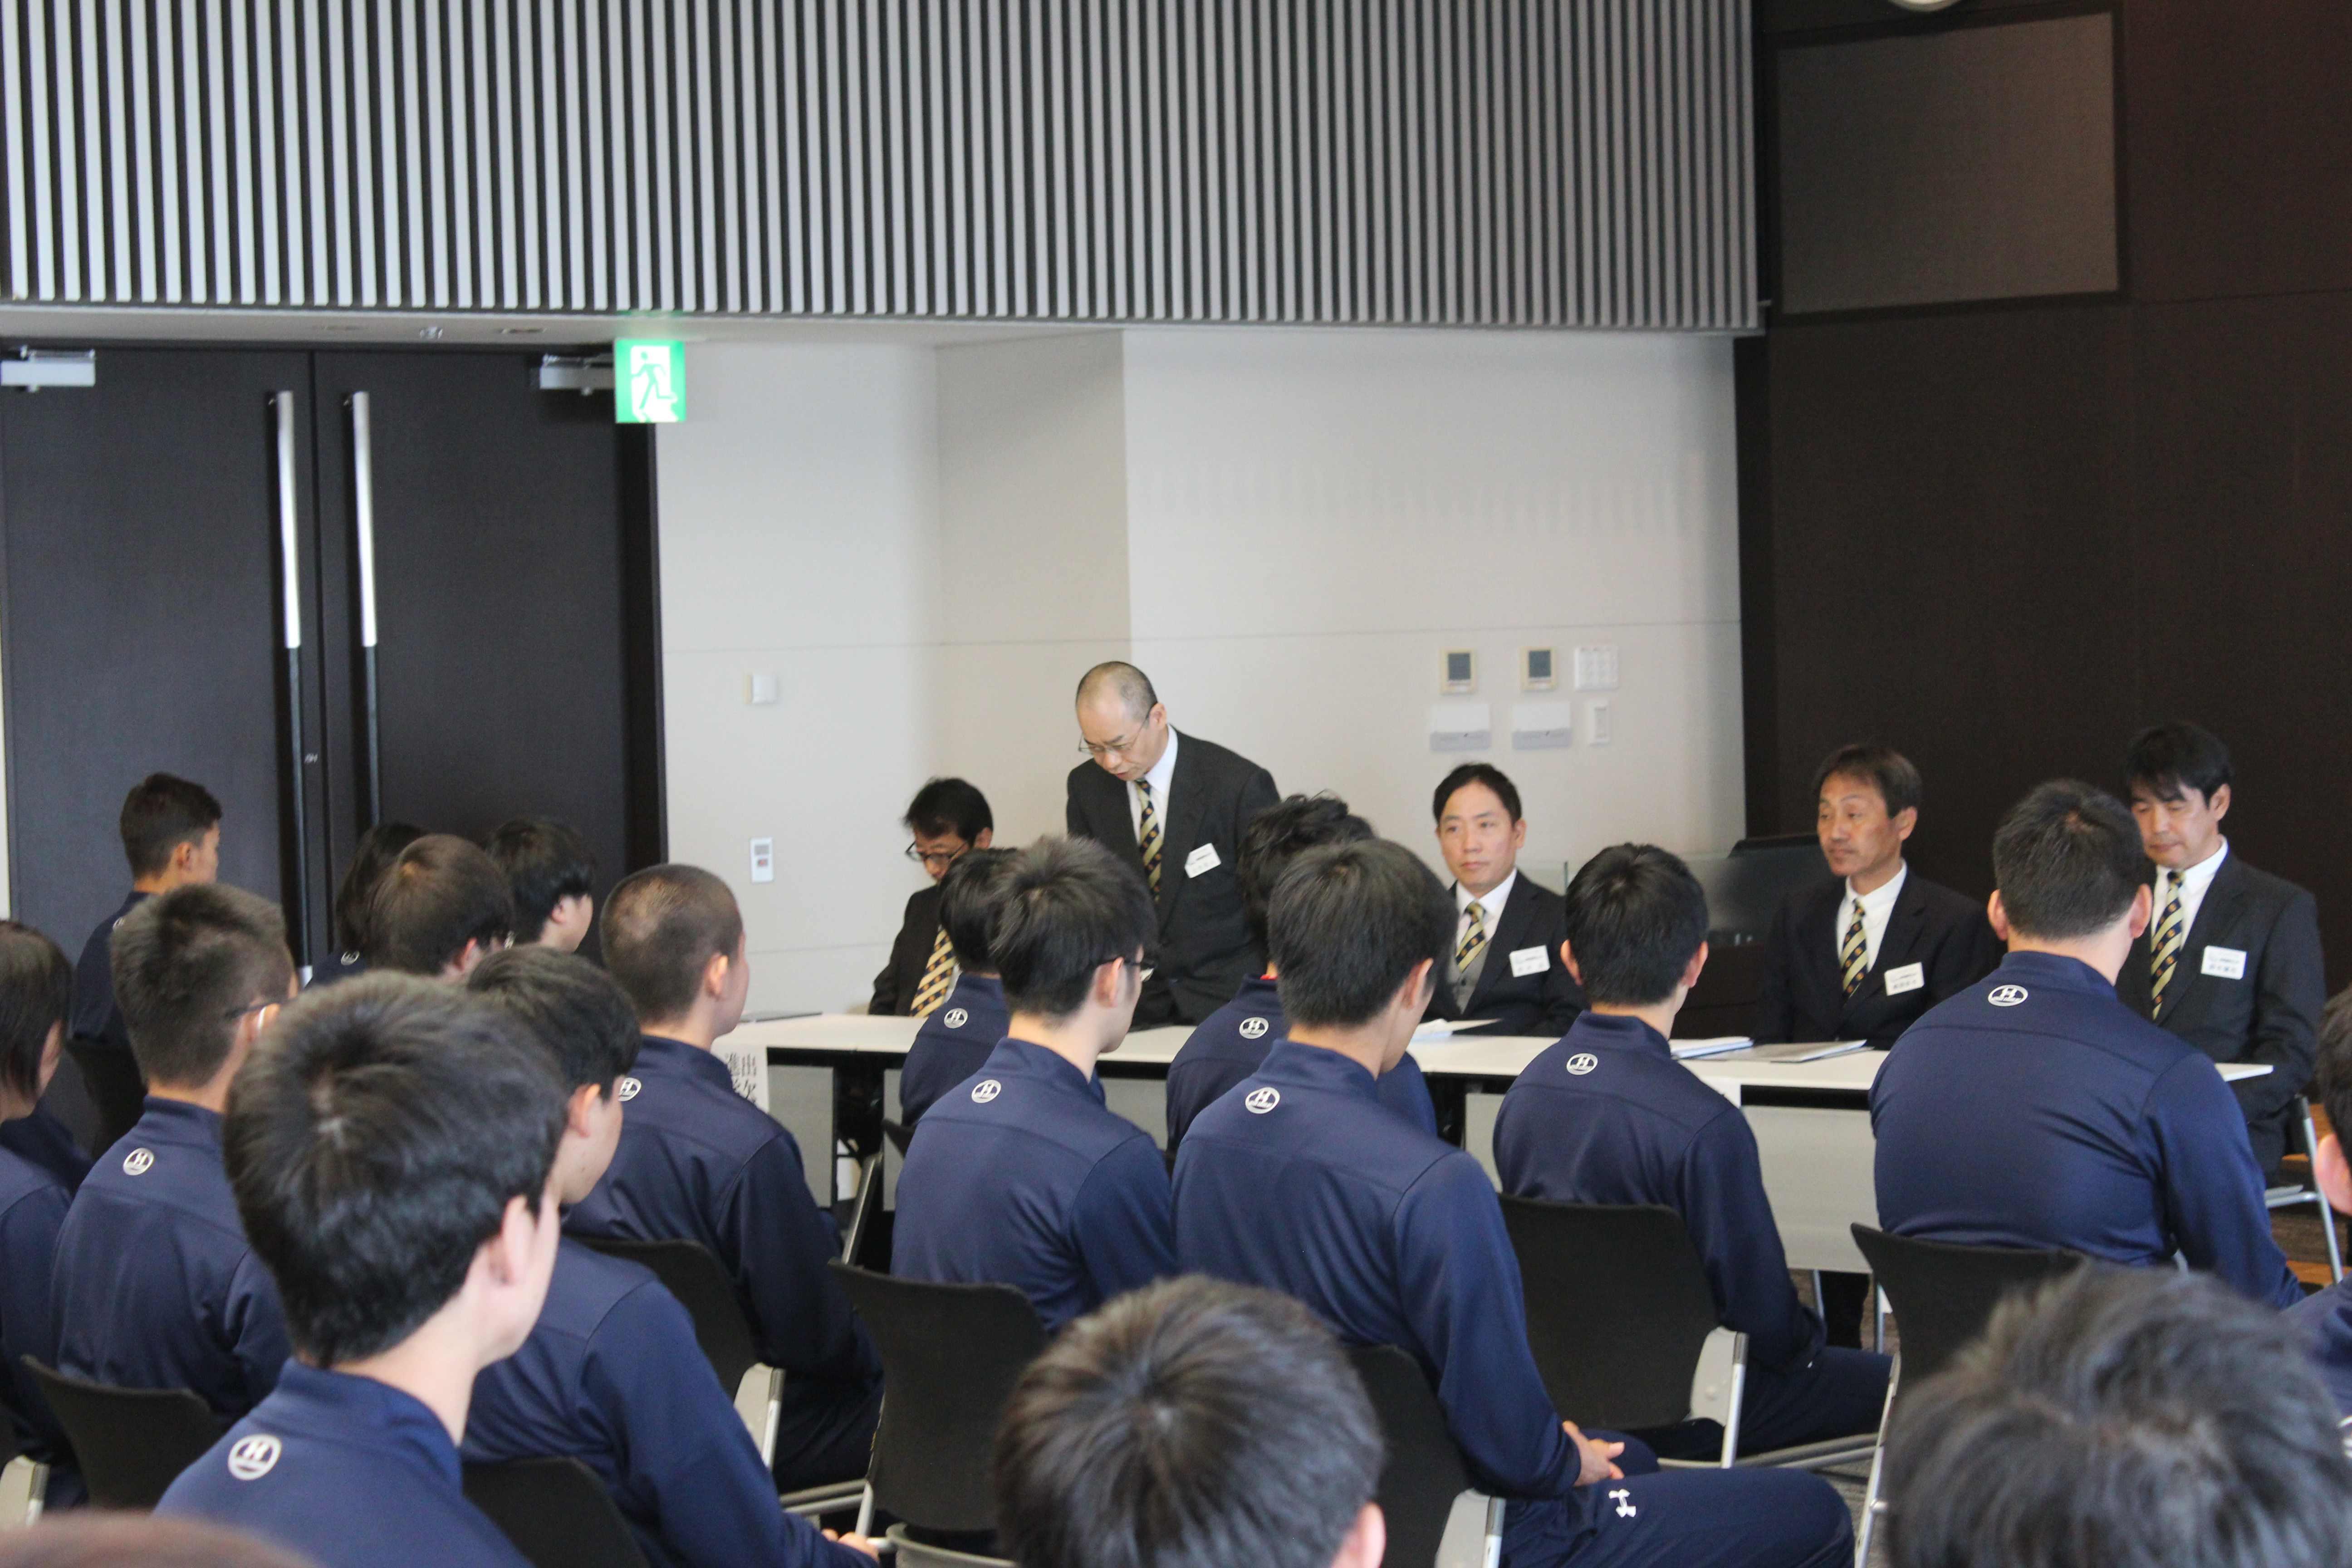 hatano421入学式5.jpg